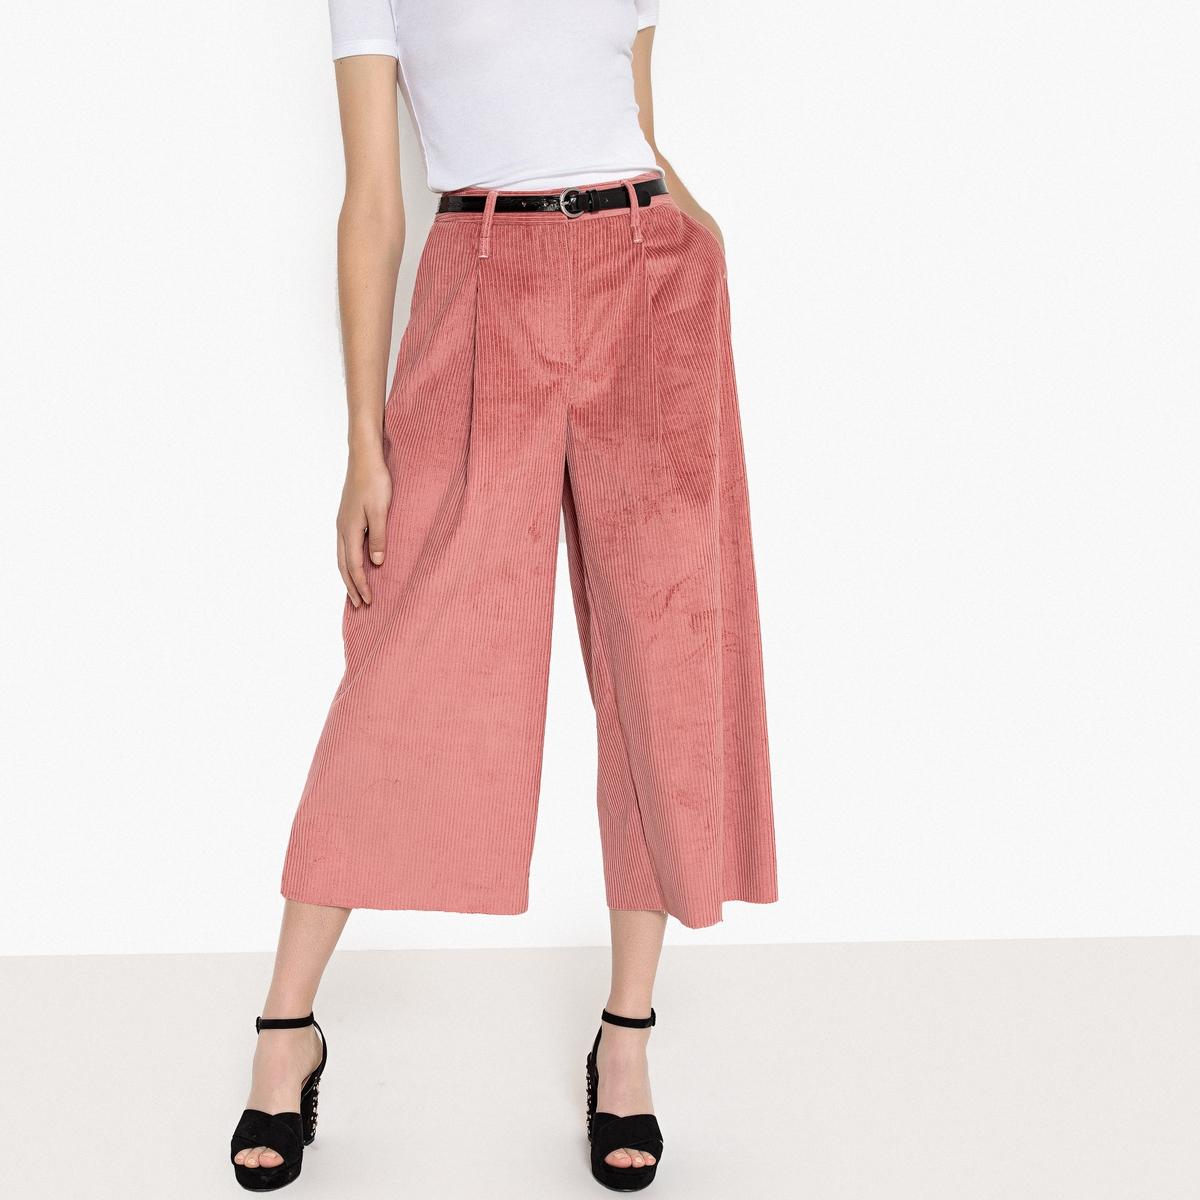 Falda pantalón de pana con acabado sin remate